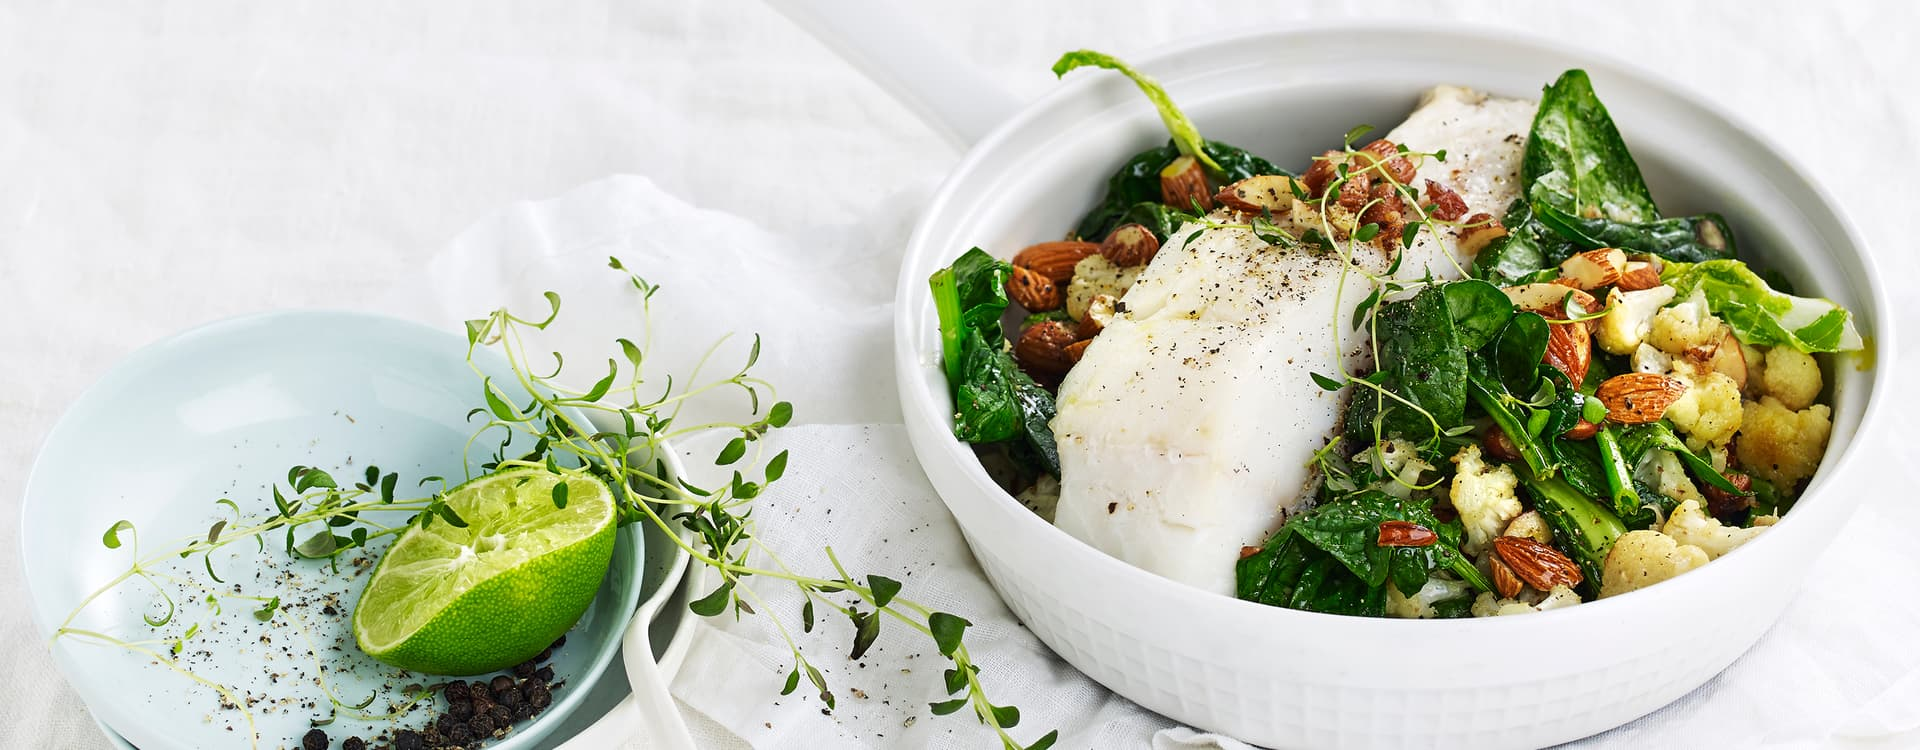 Lettsaltet torsk med pannestekt blomkål, spinat og mandel